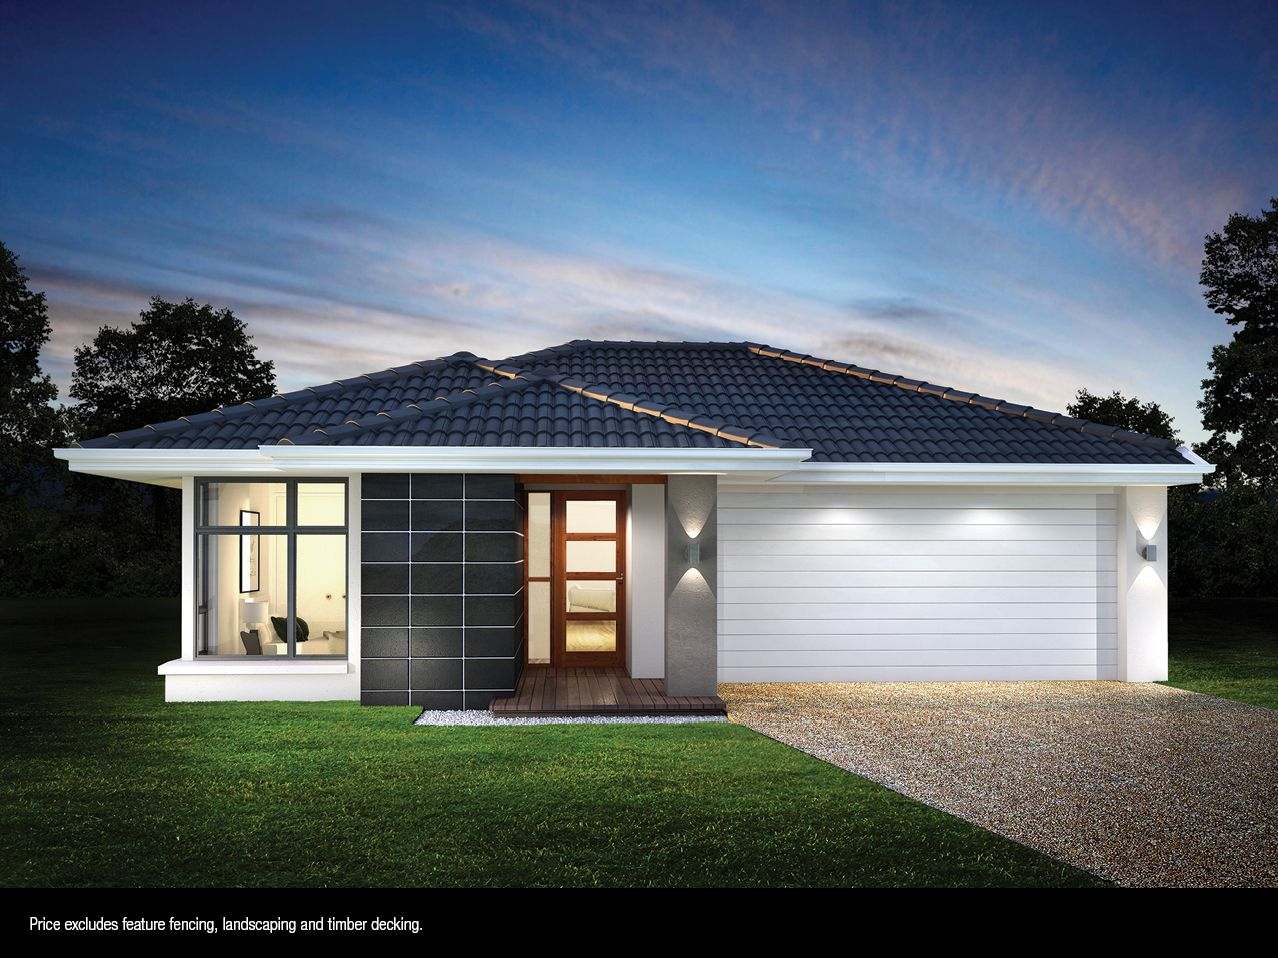 Lot 252 Imperial Crescent, Narangba QLD 4504, Image 0